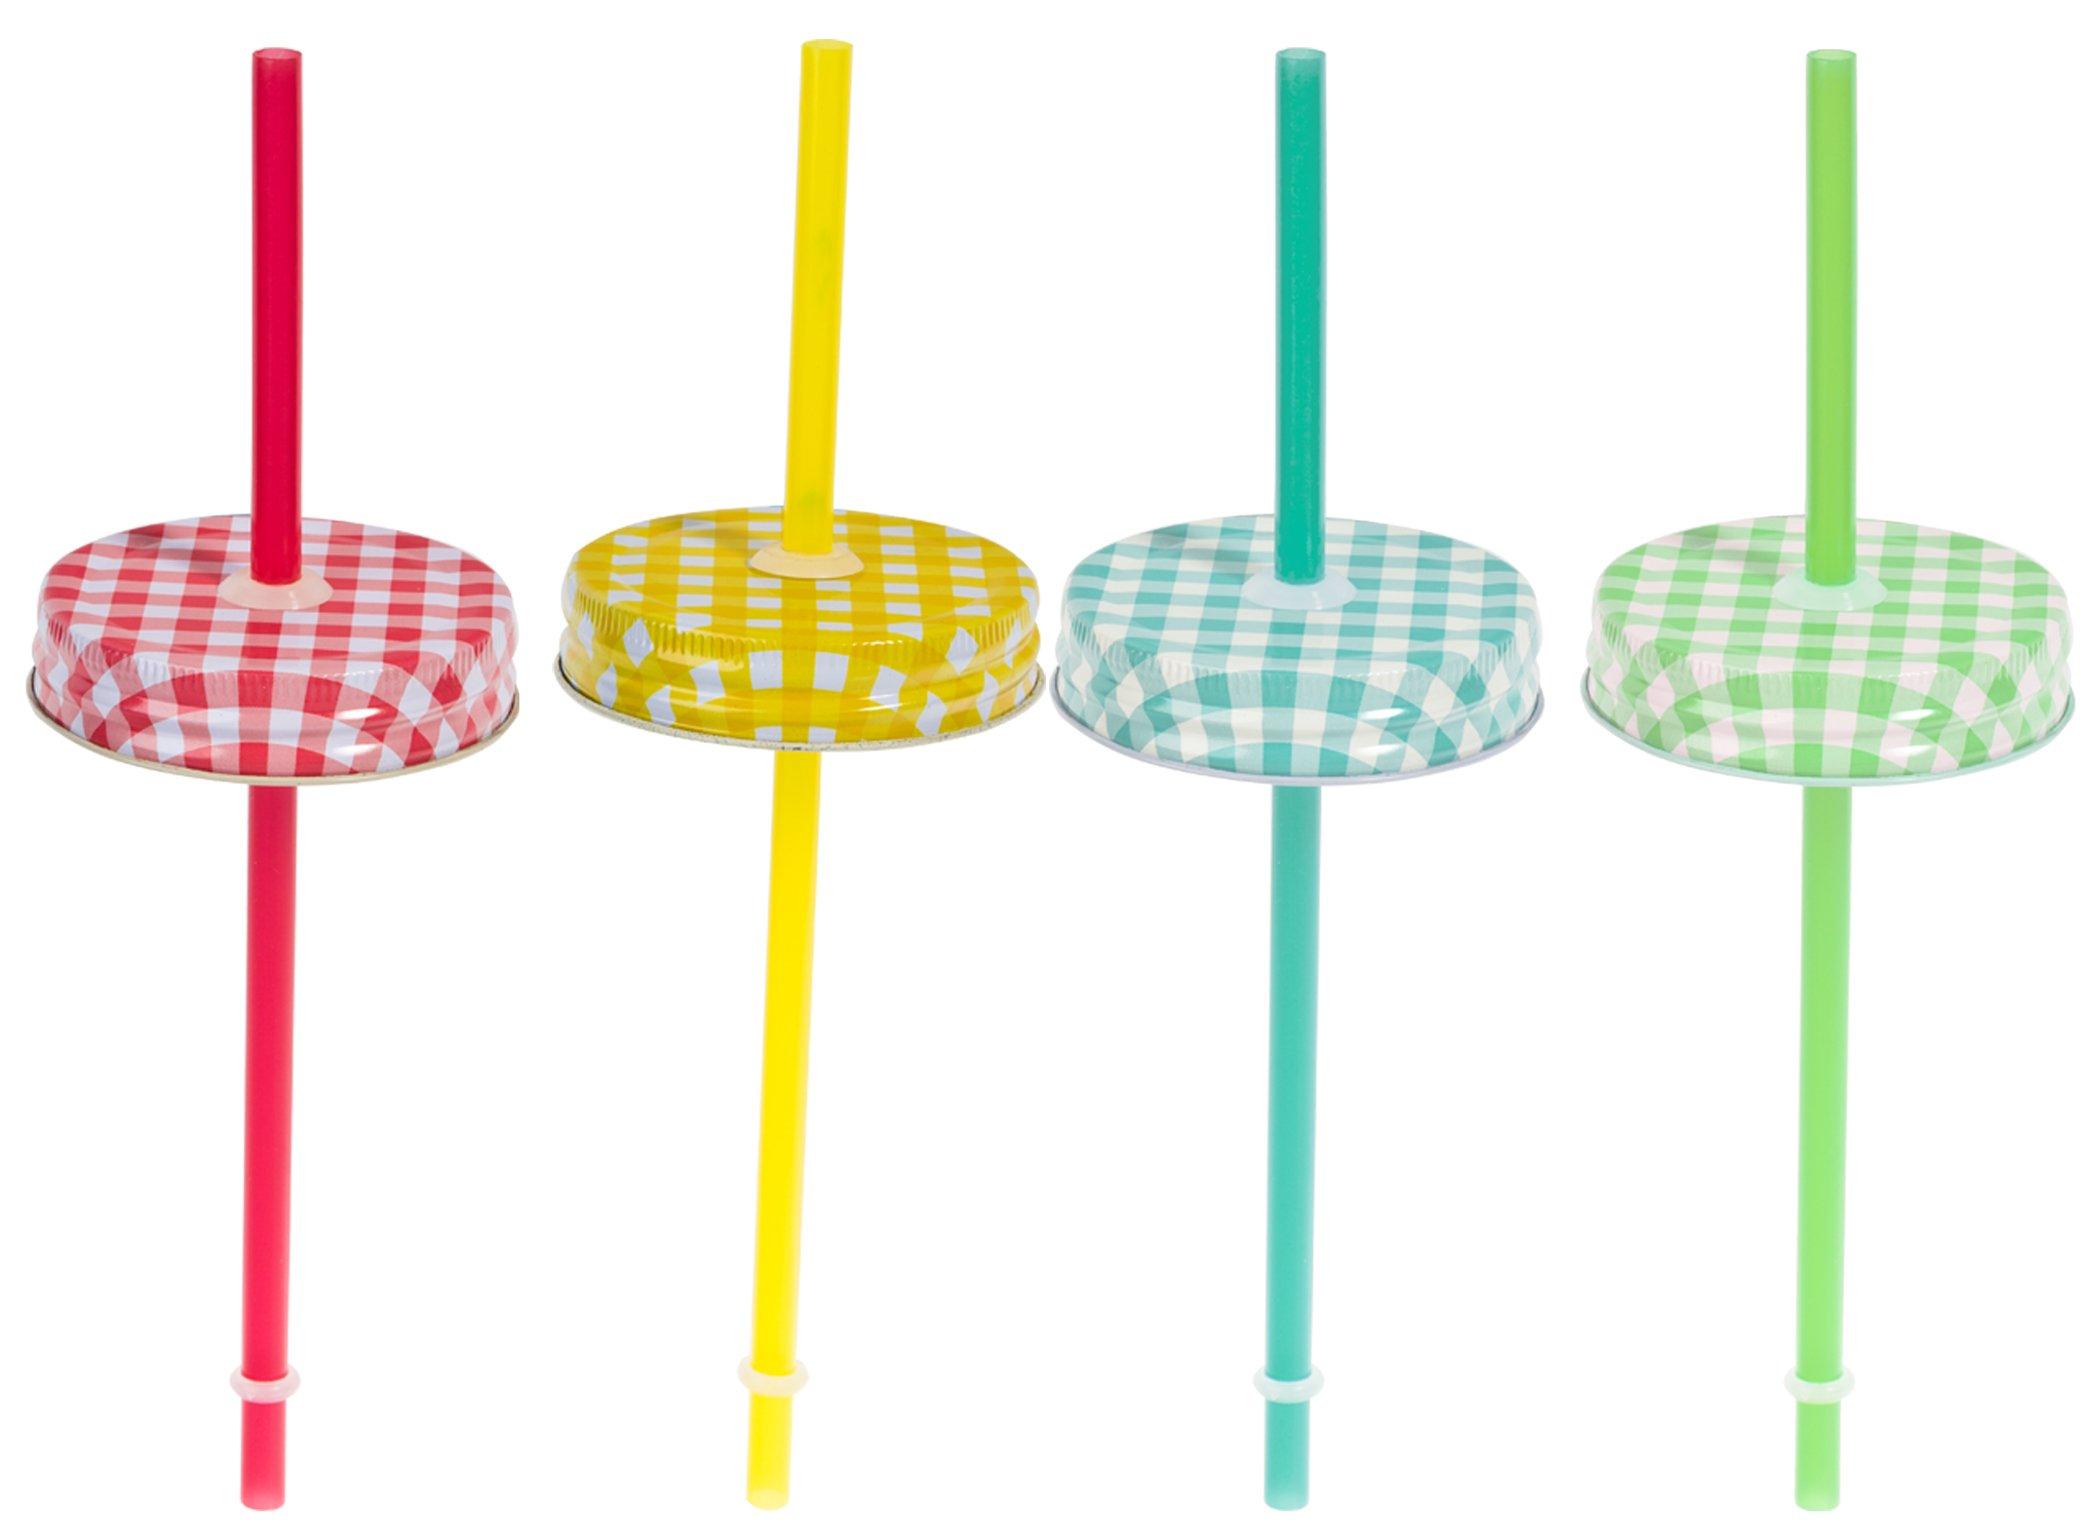 Set of Four (4) Regular Mouth Mason Jar Straw Lids with Straws (Gingham)